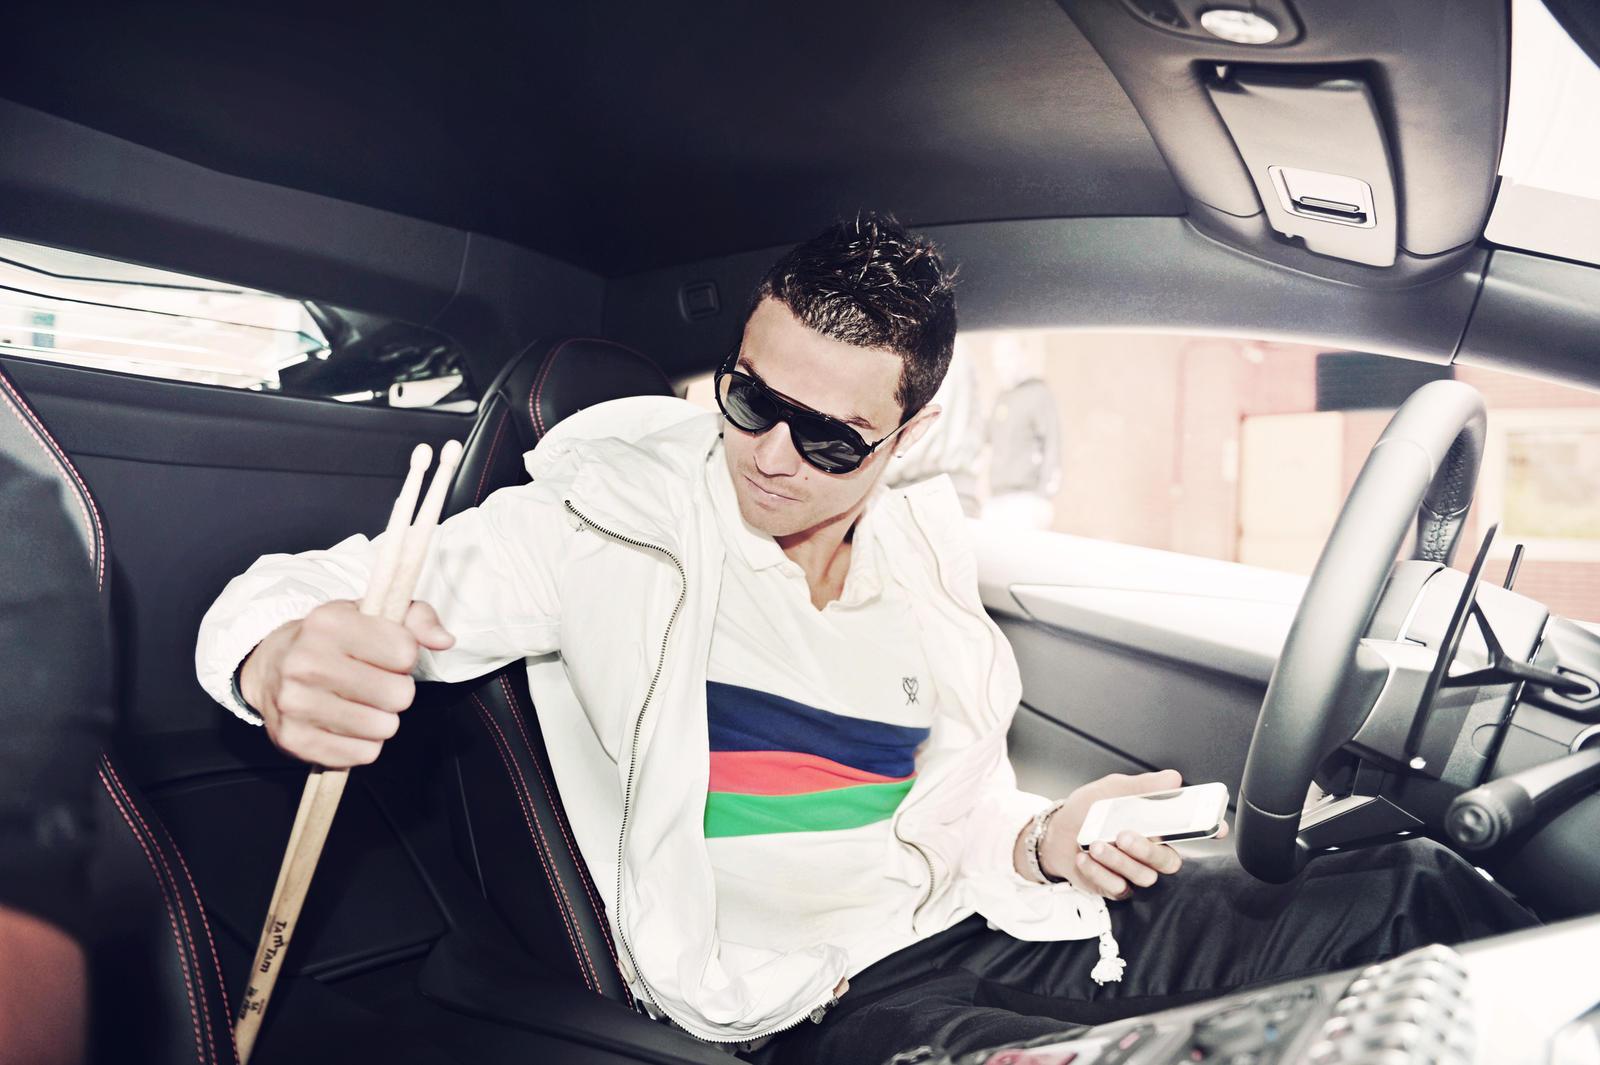 Cristiano Ronaldo House 2013